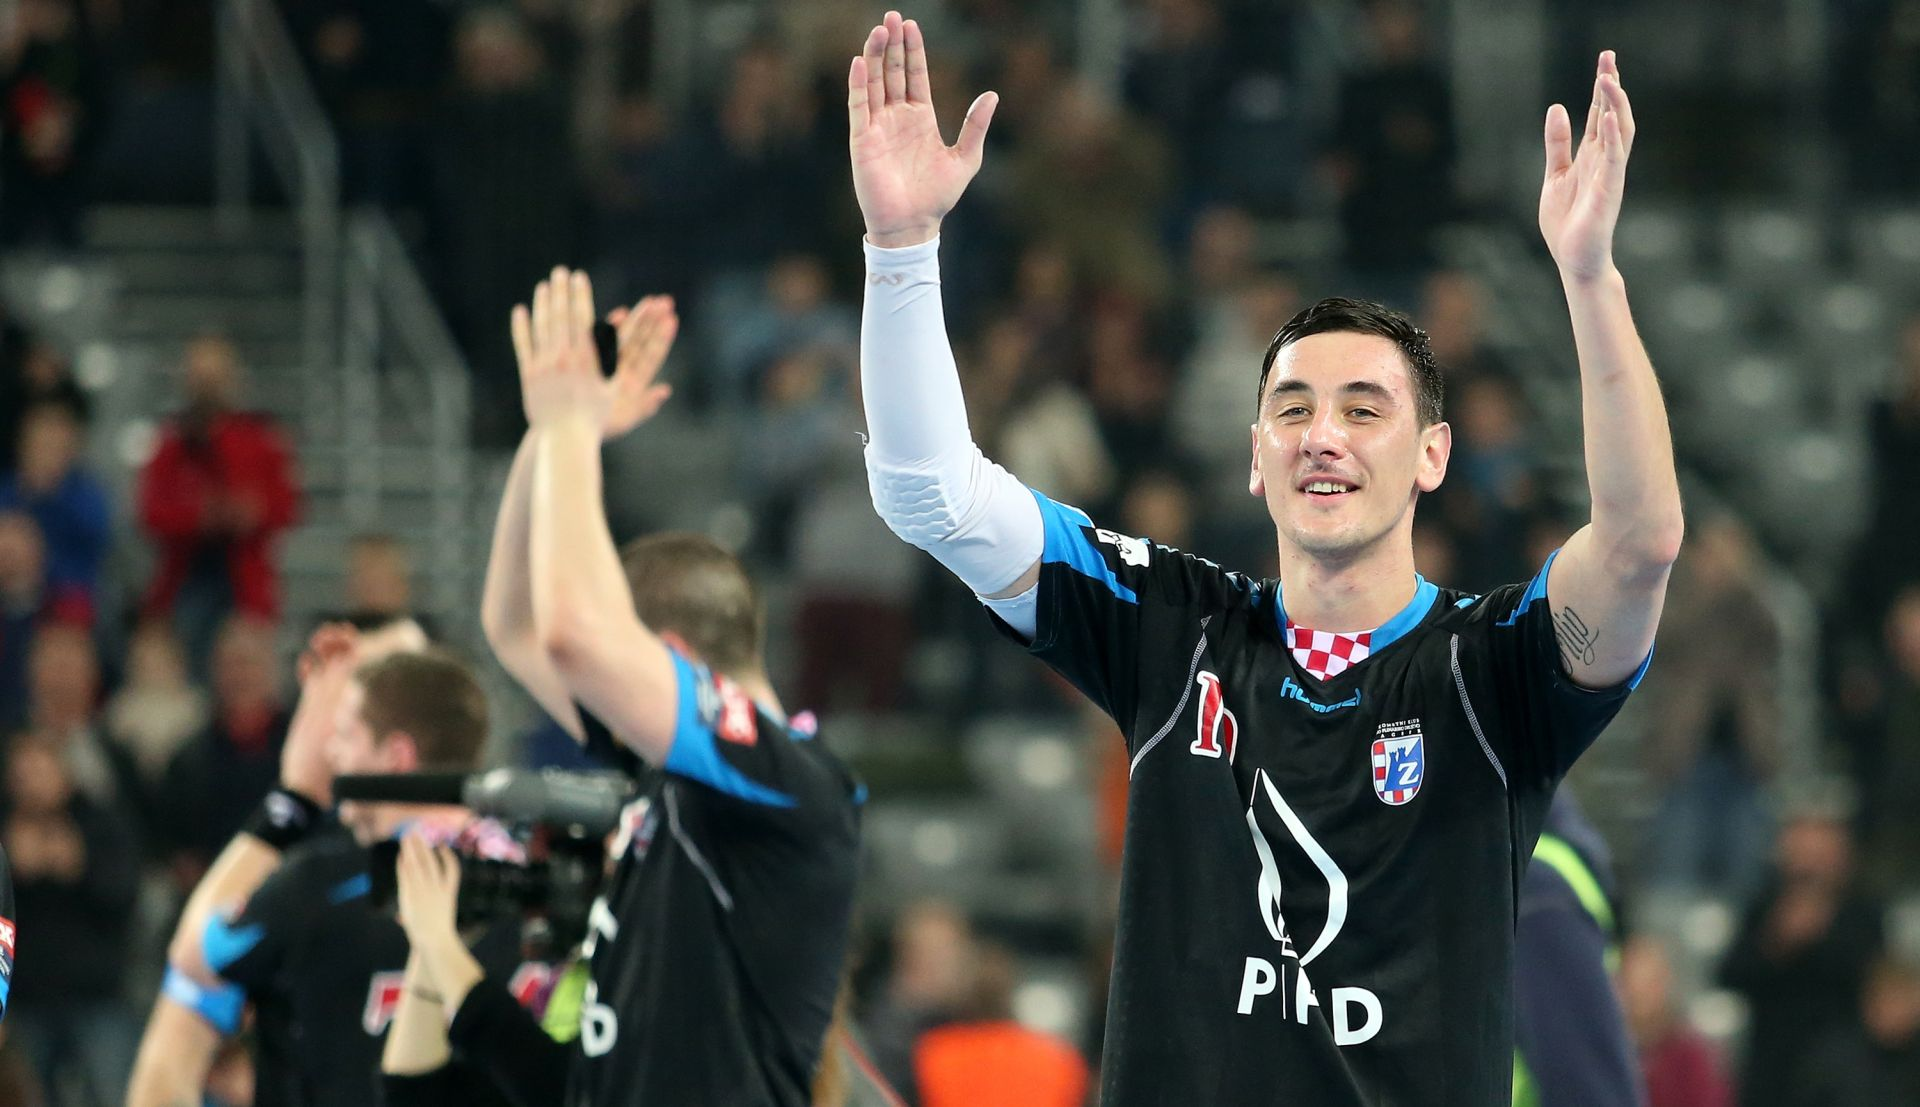 VIDEO: IZABRAO EHF Čak dva igrača Zagreba u Top 5 golova Lige prvaka, gol Čelice najbolji